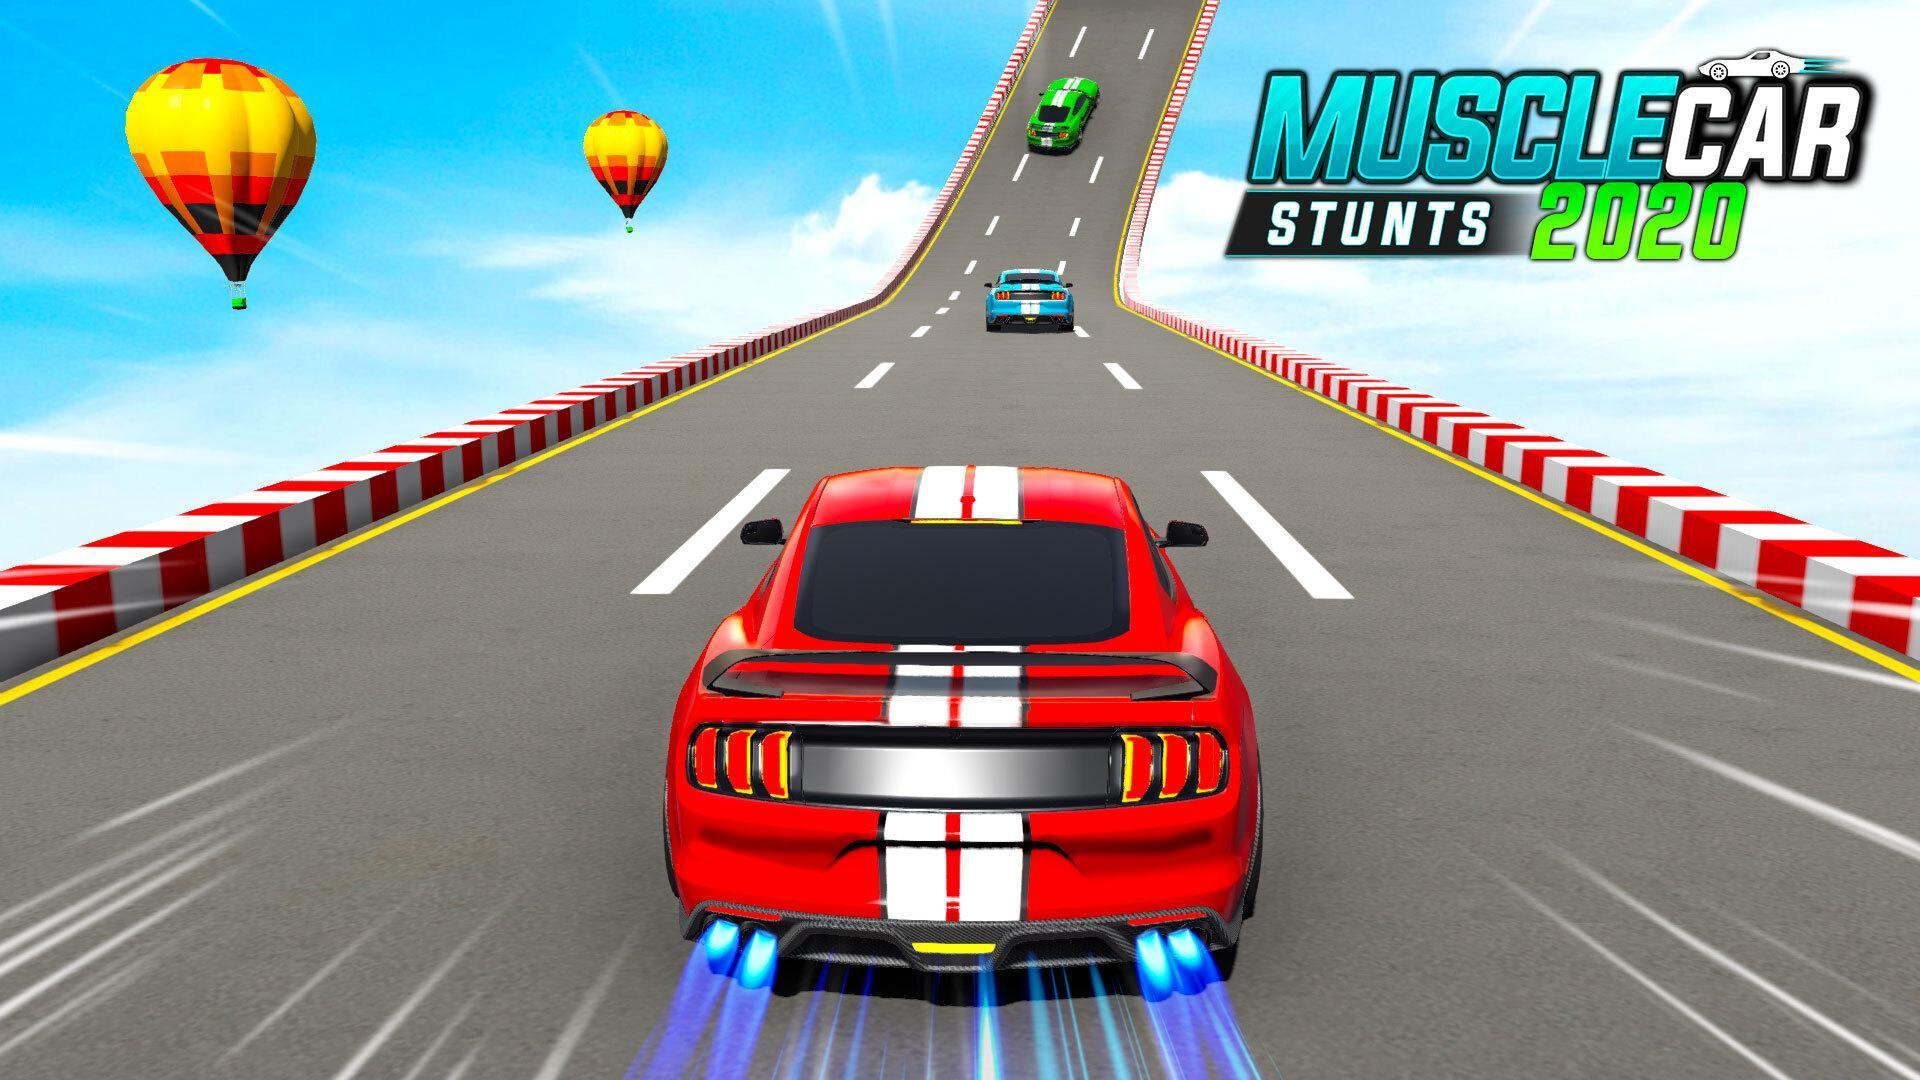 Muscle Car Stunts 2020 Mega Ramp Stunt Car Games 1.0.9 Screenshot 17